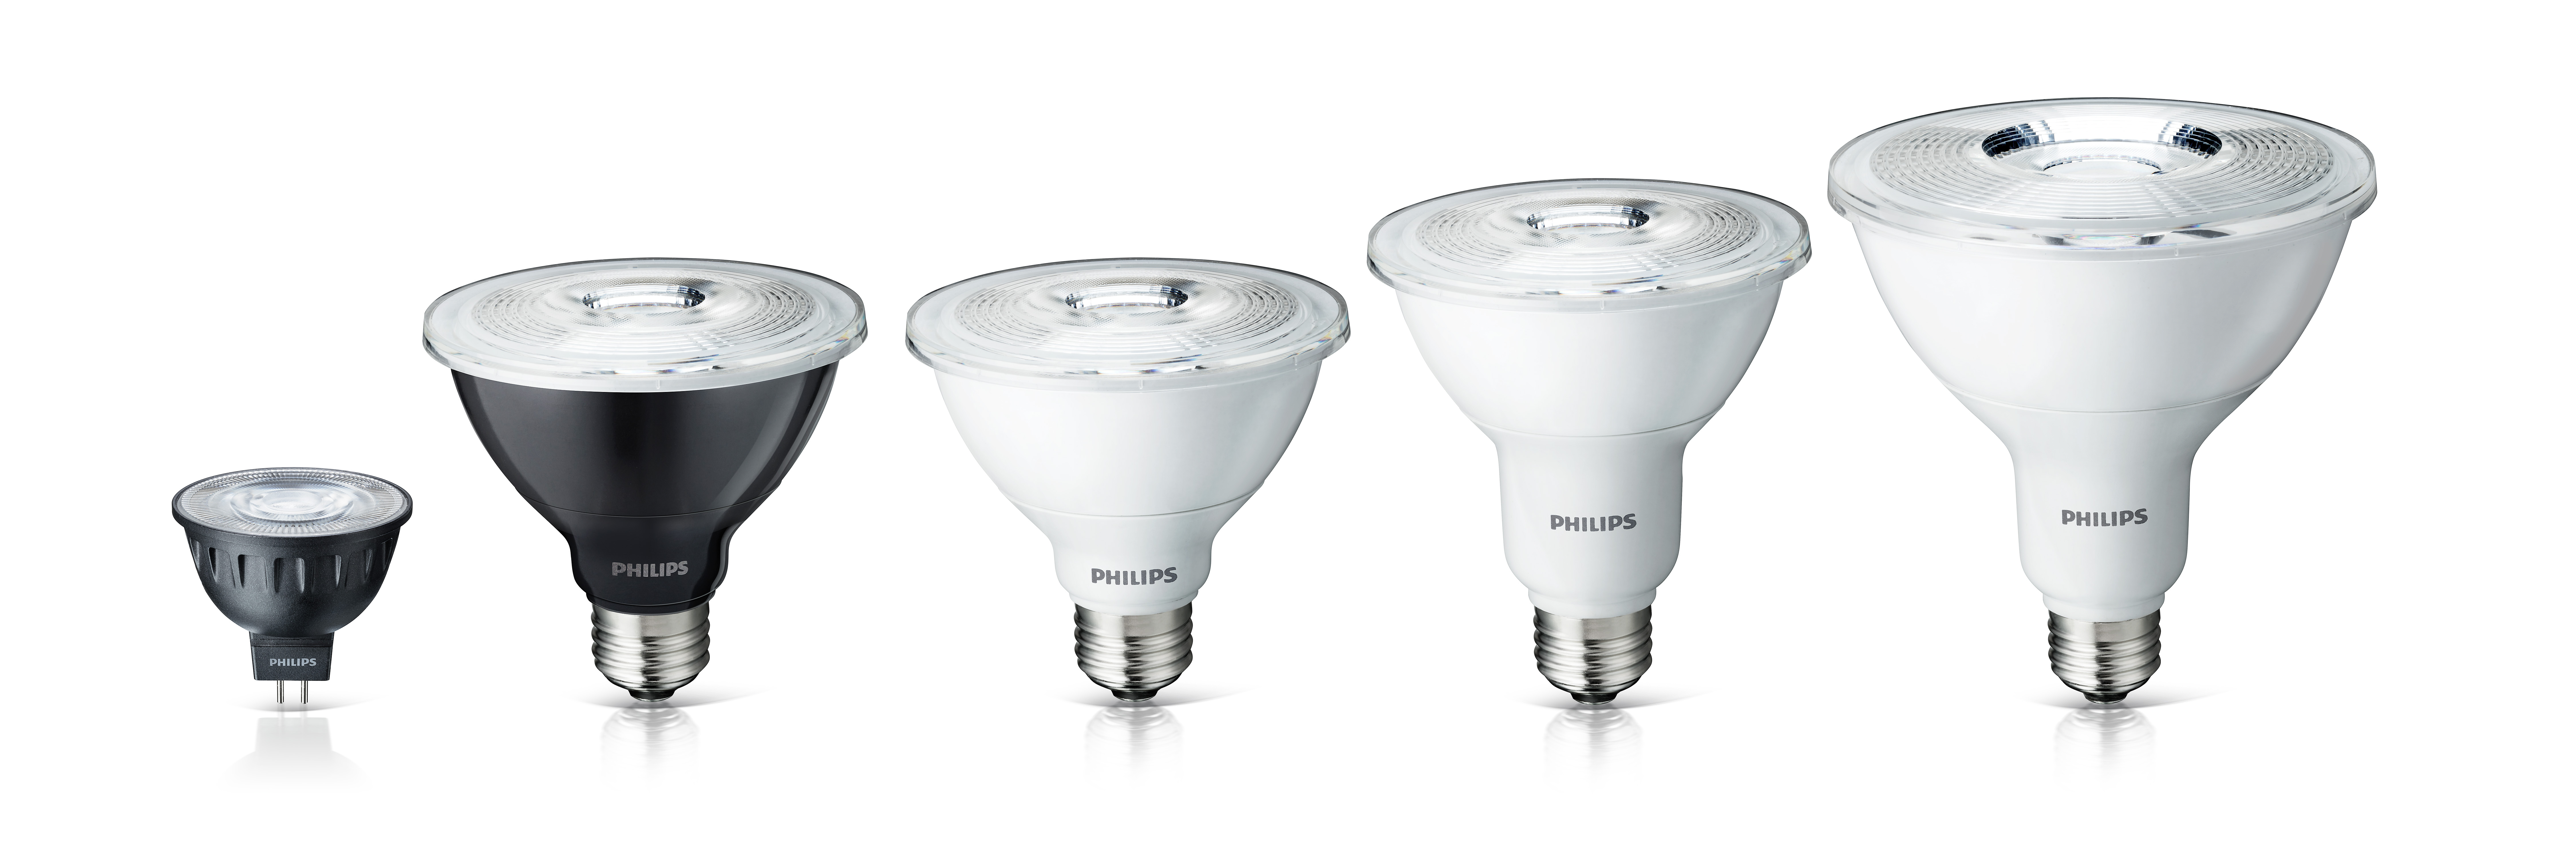 philips shop non led the gls dim bulb lighting light